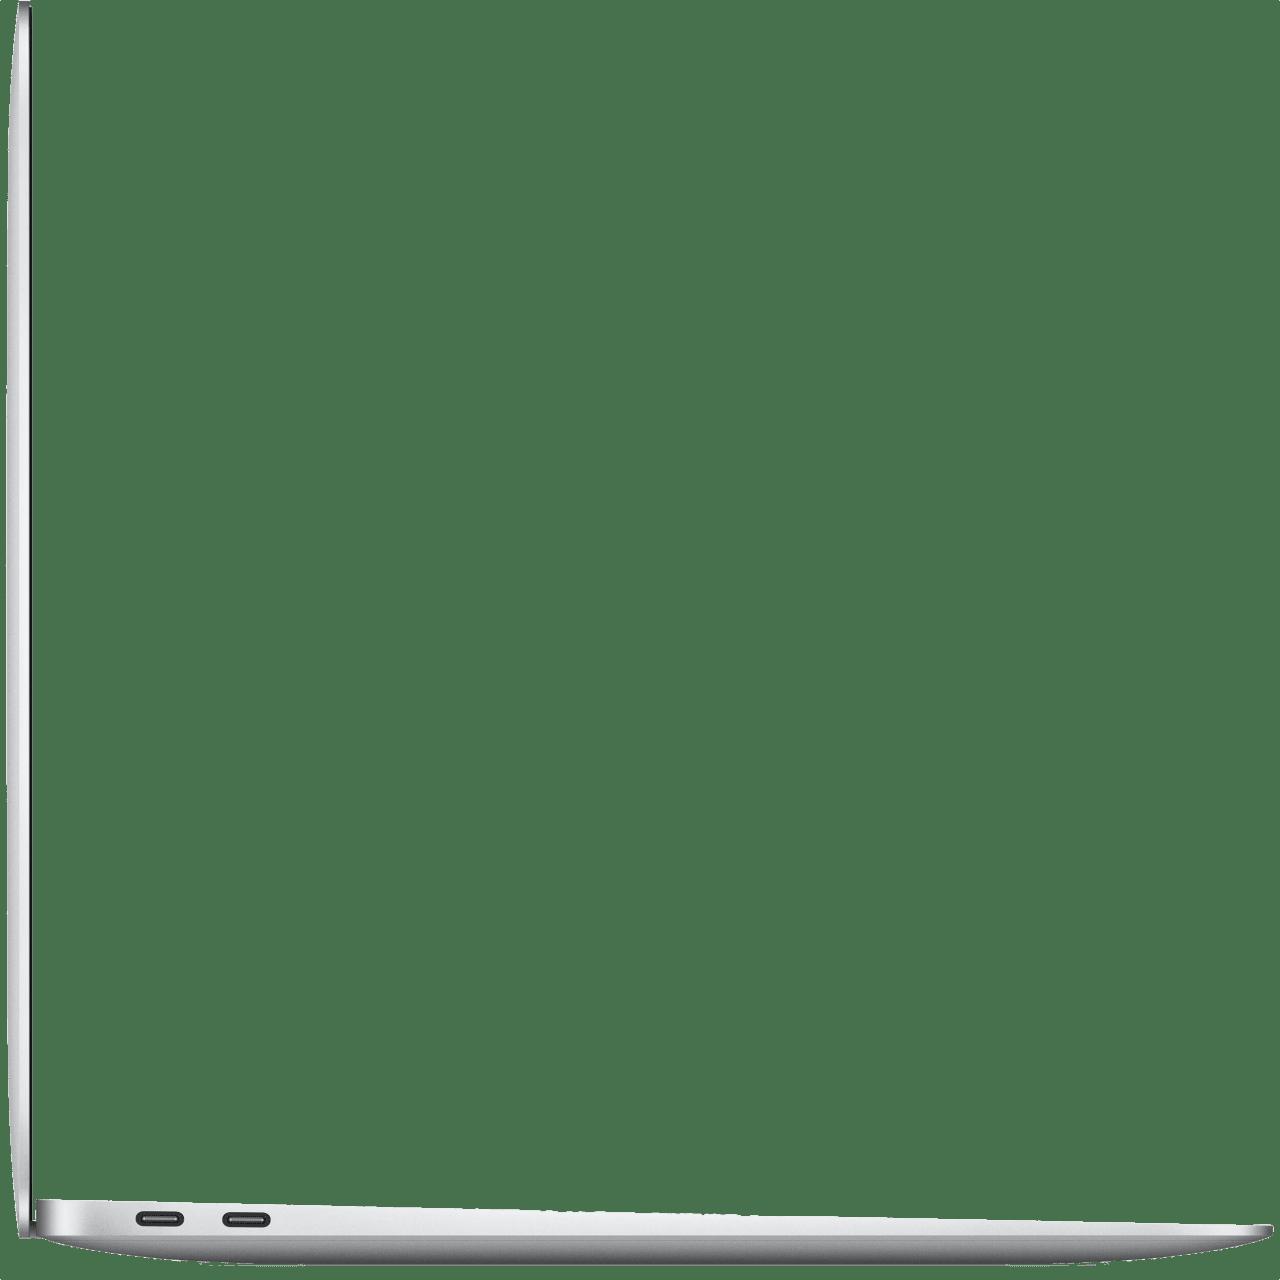 Silber Apple MacBook Air (Late 2020) Notebook - Apple M1 - 8GB - 256GB SSD - Apple Integrated 7-core GPU.3